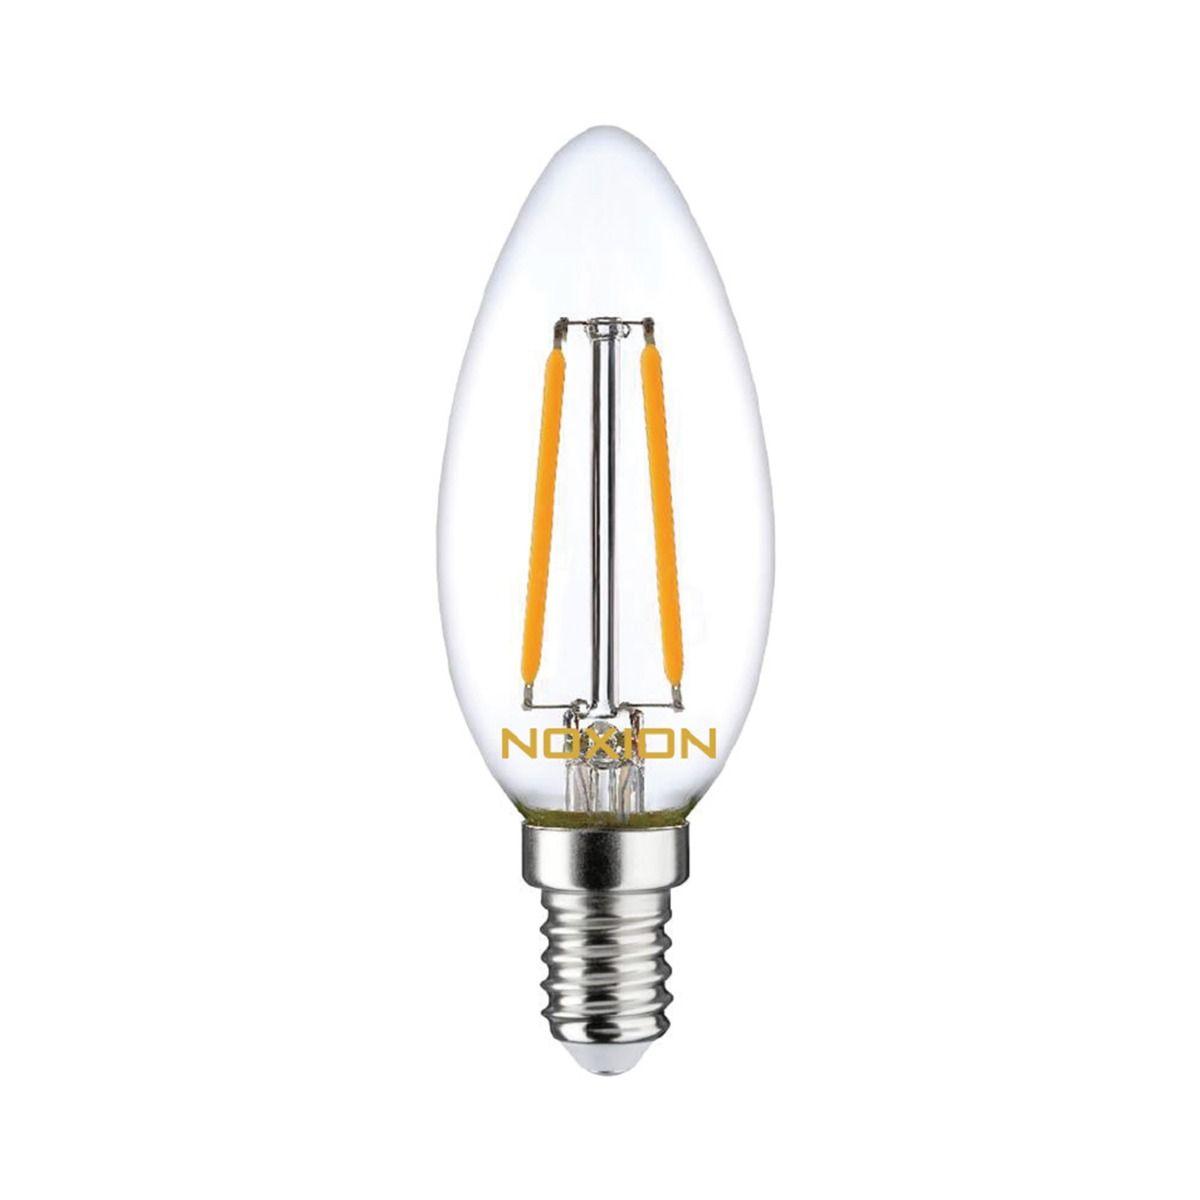 Noxion Lucent Filament LED Bougie B35 E14 2.5W 250lm 827 | Dimmable - Remplacement 25W